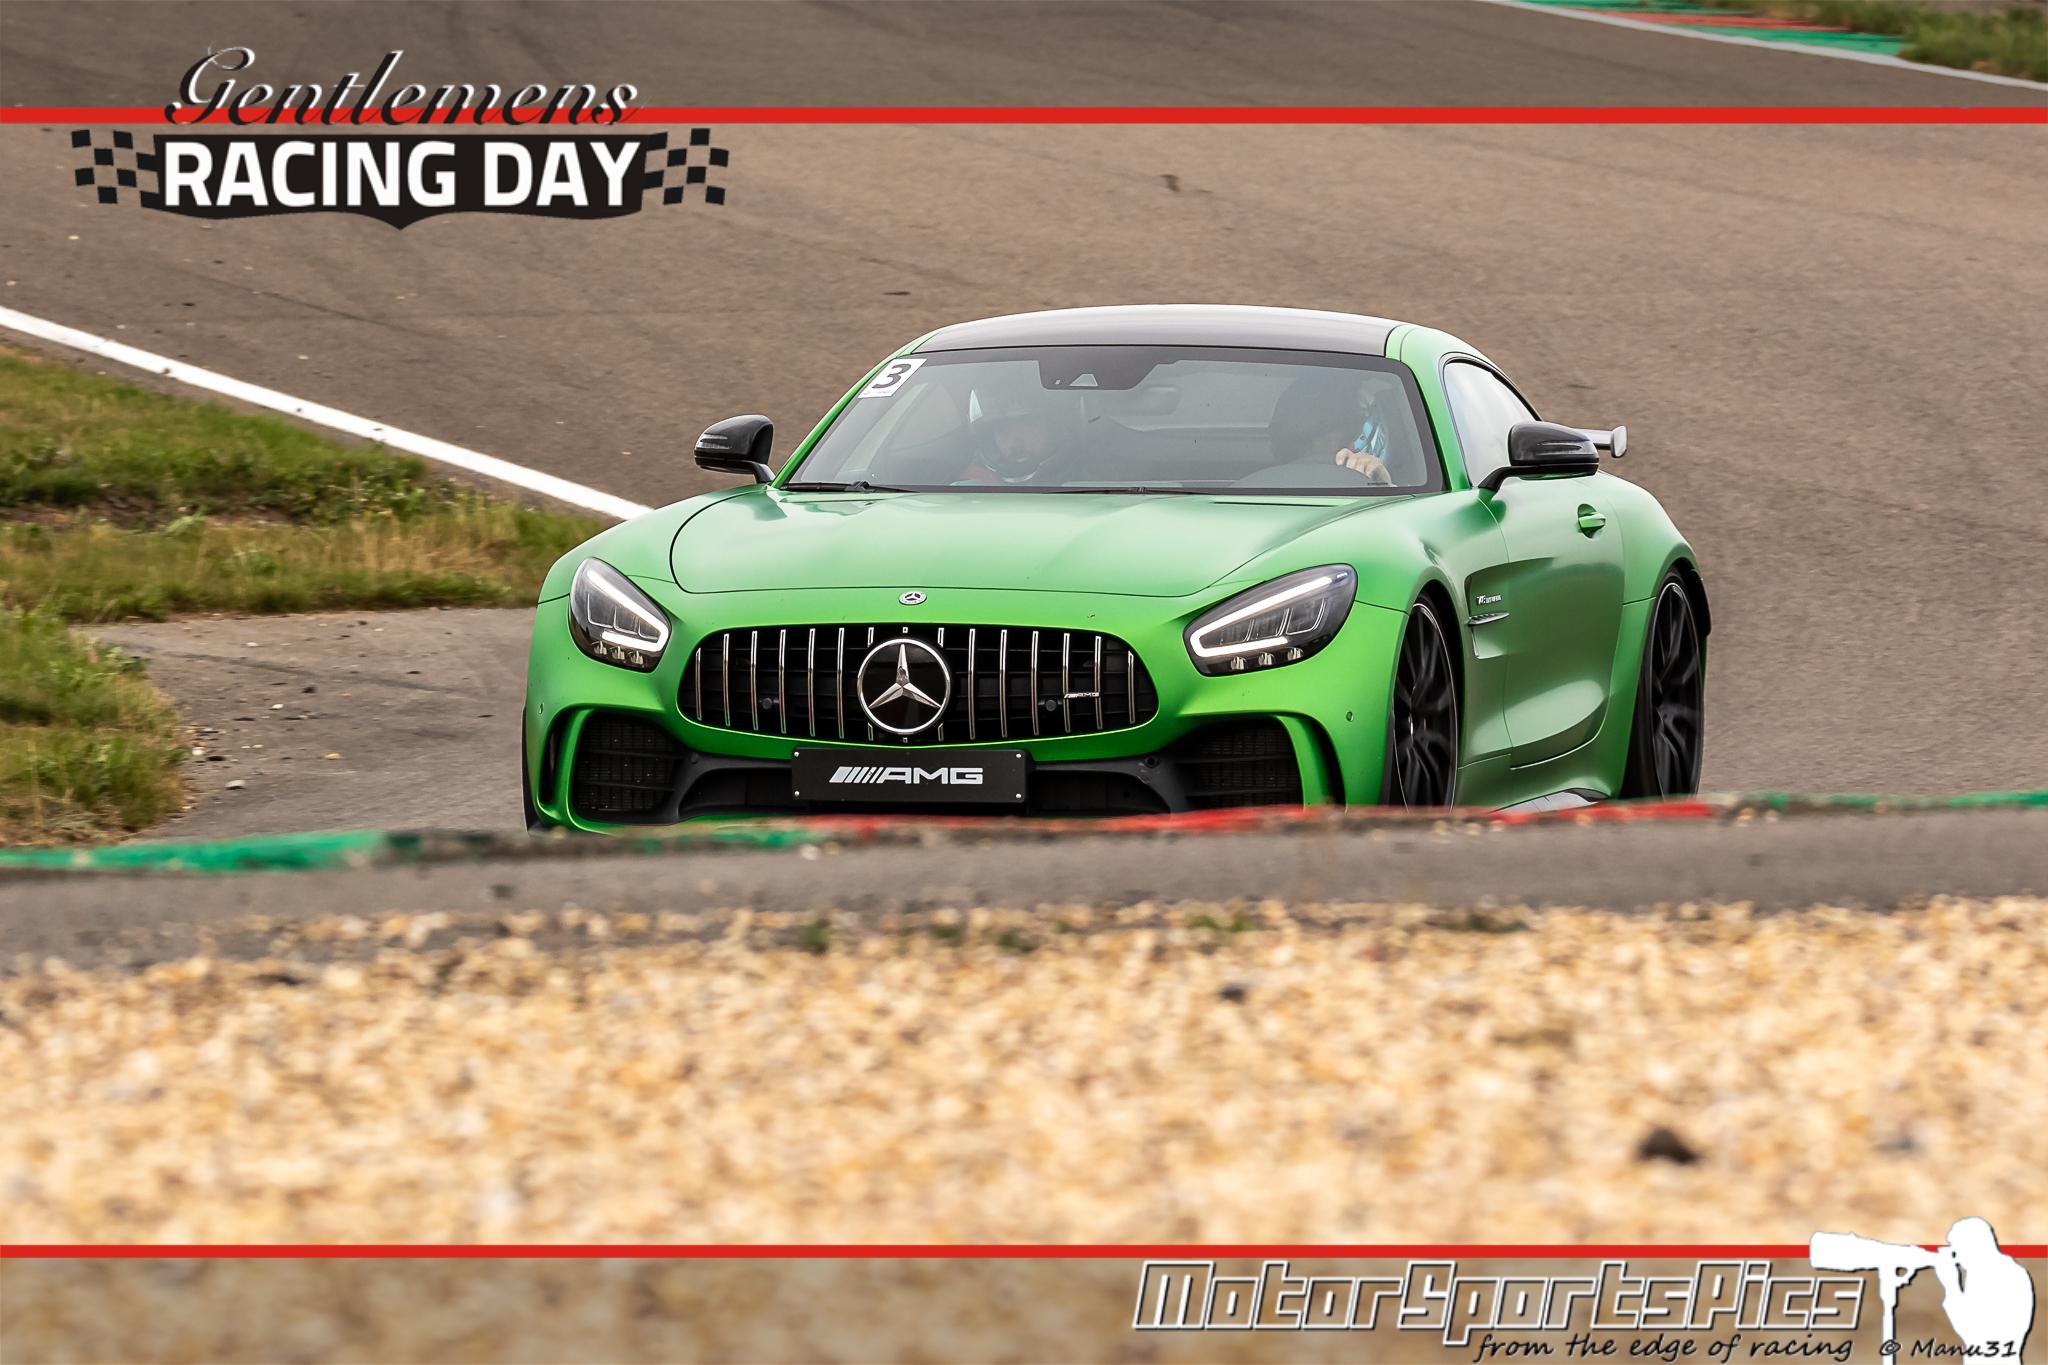 04-09-2020 Gentlemen's Racing day at Mettet group Red